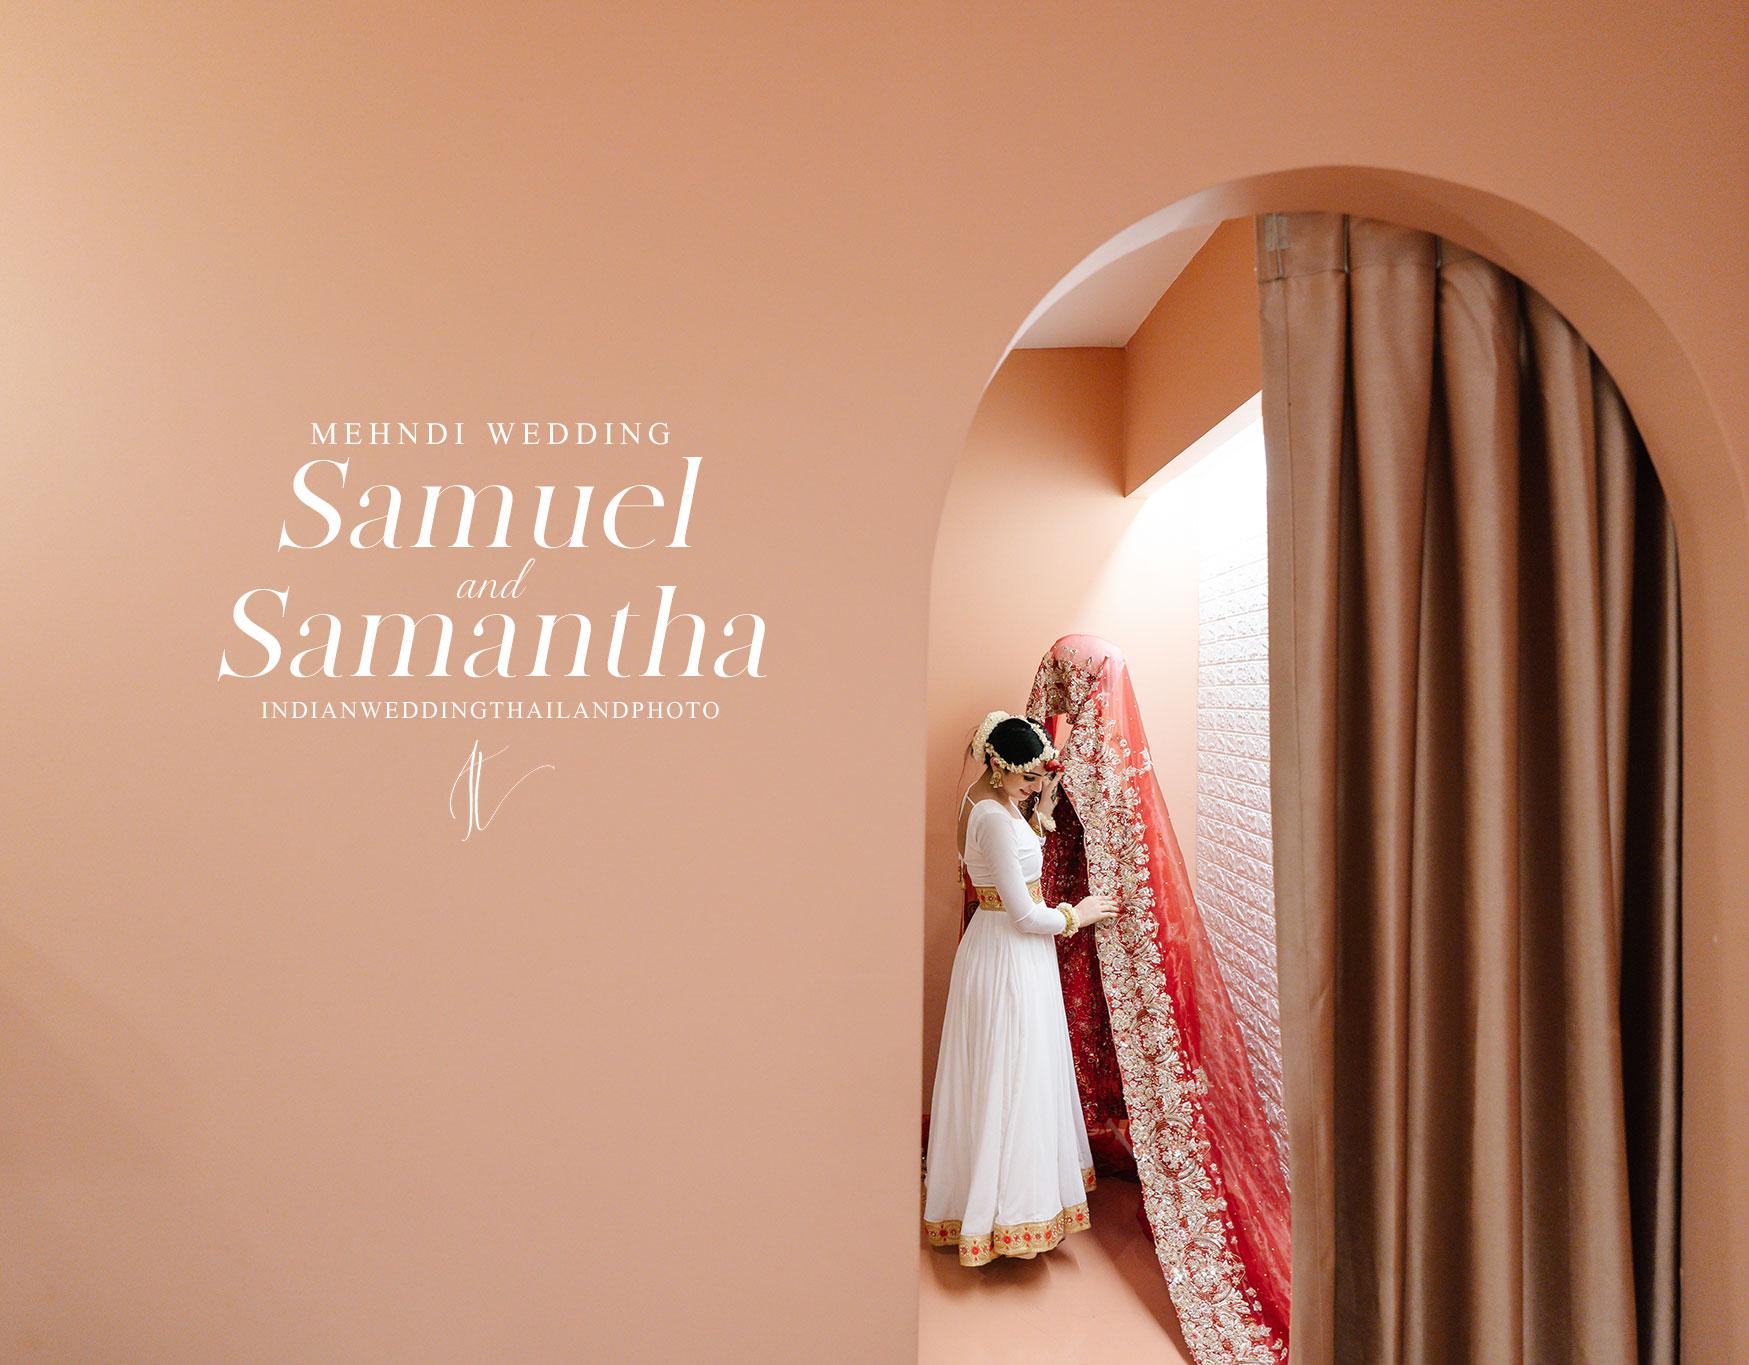 mehndi indian wedding party samuel cover